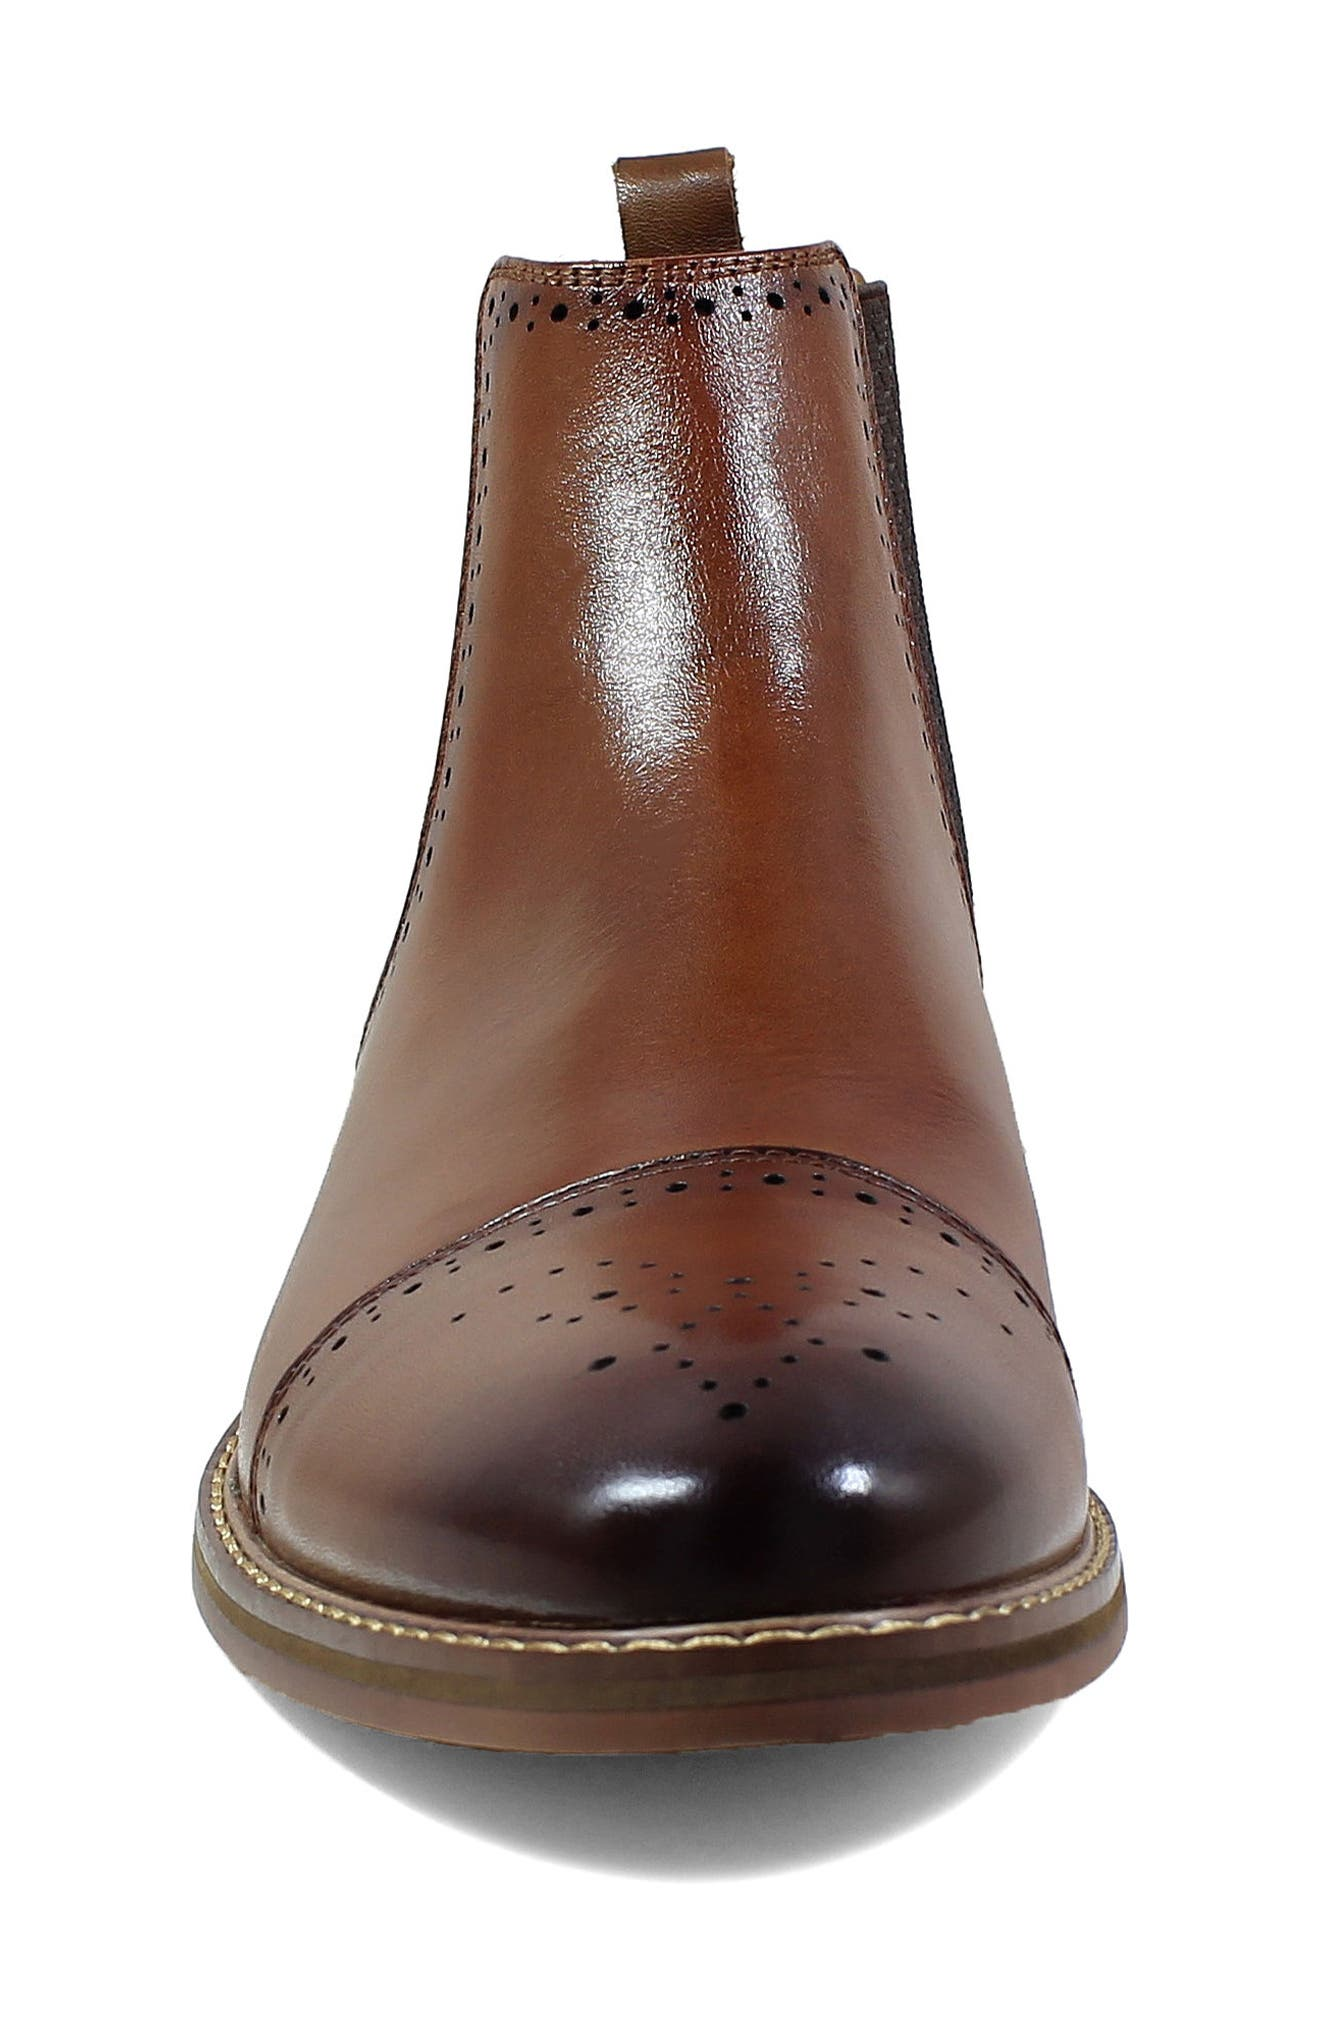 Alomar Chelsea Boot,                             Alternate thumbnail 4, color,                             Cognac Leather